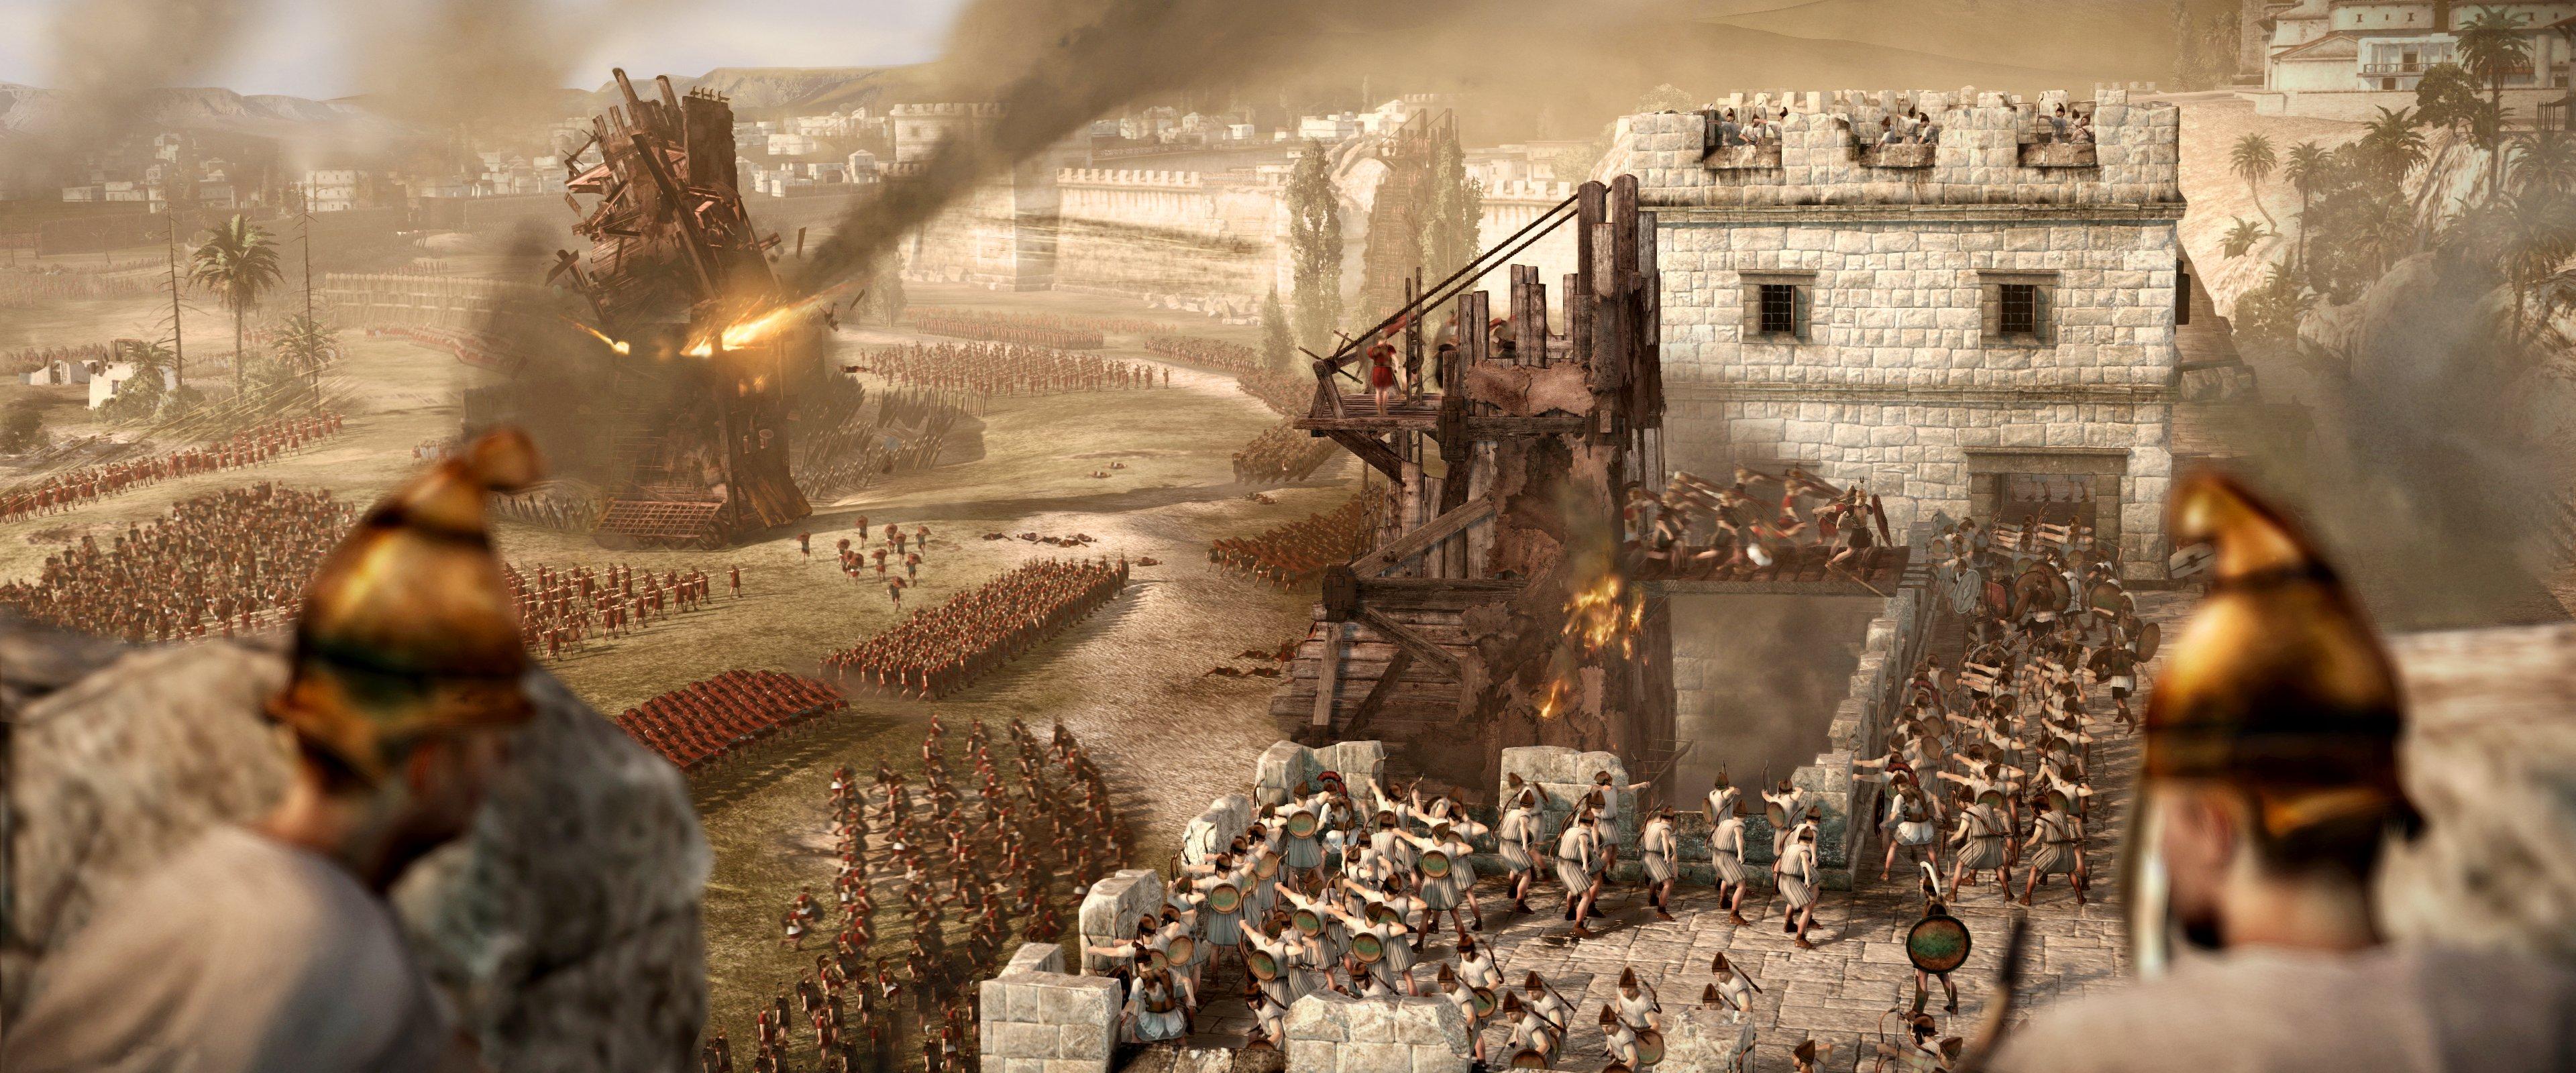 Total War Rome Ii Fondo De Pantalla Hd Fondo De